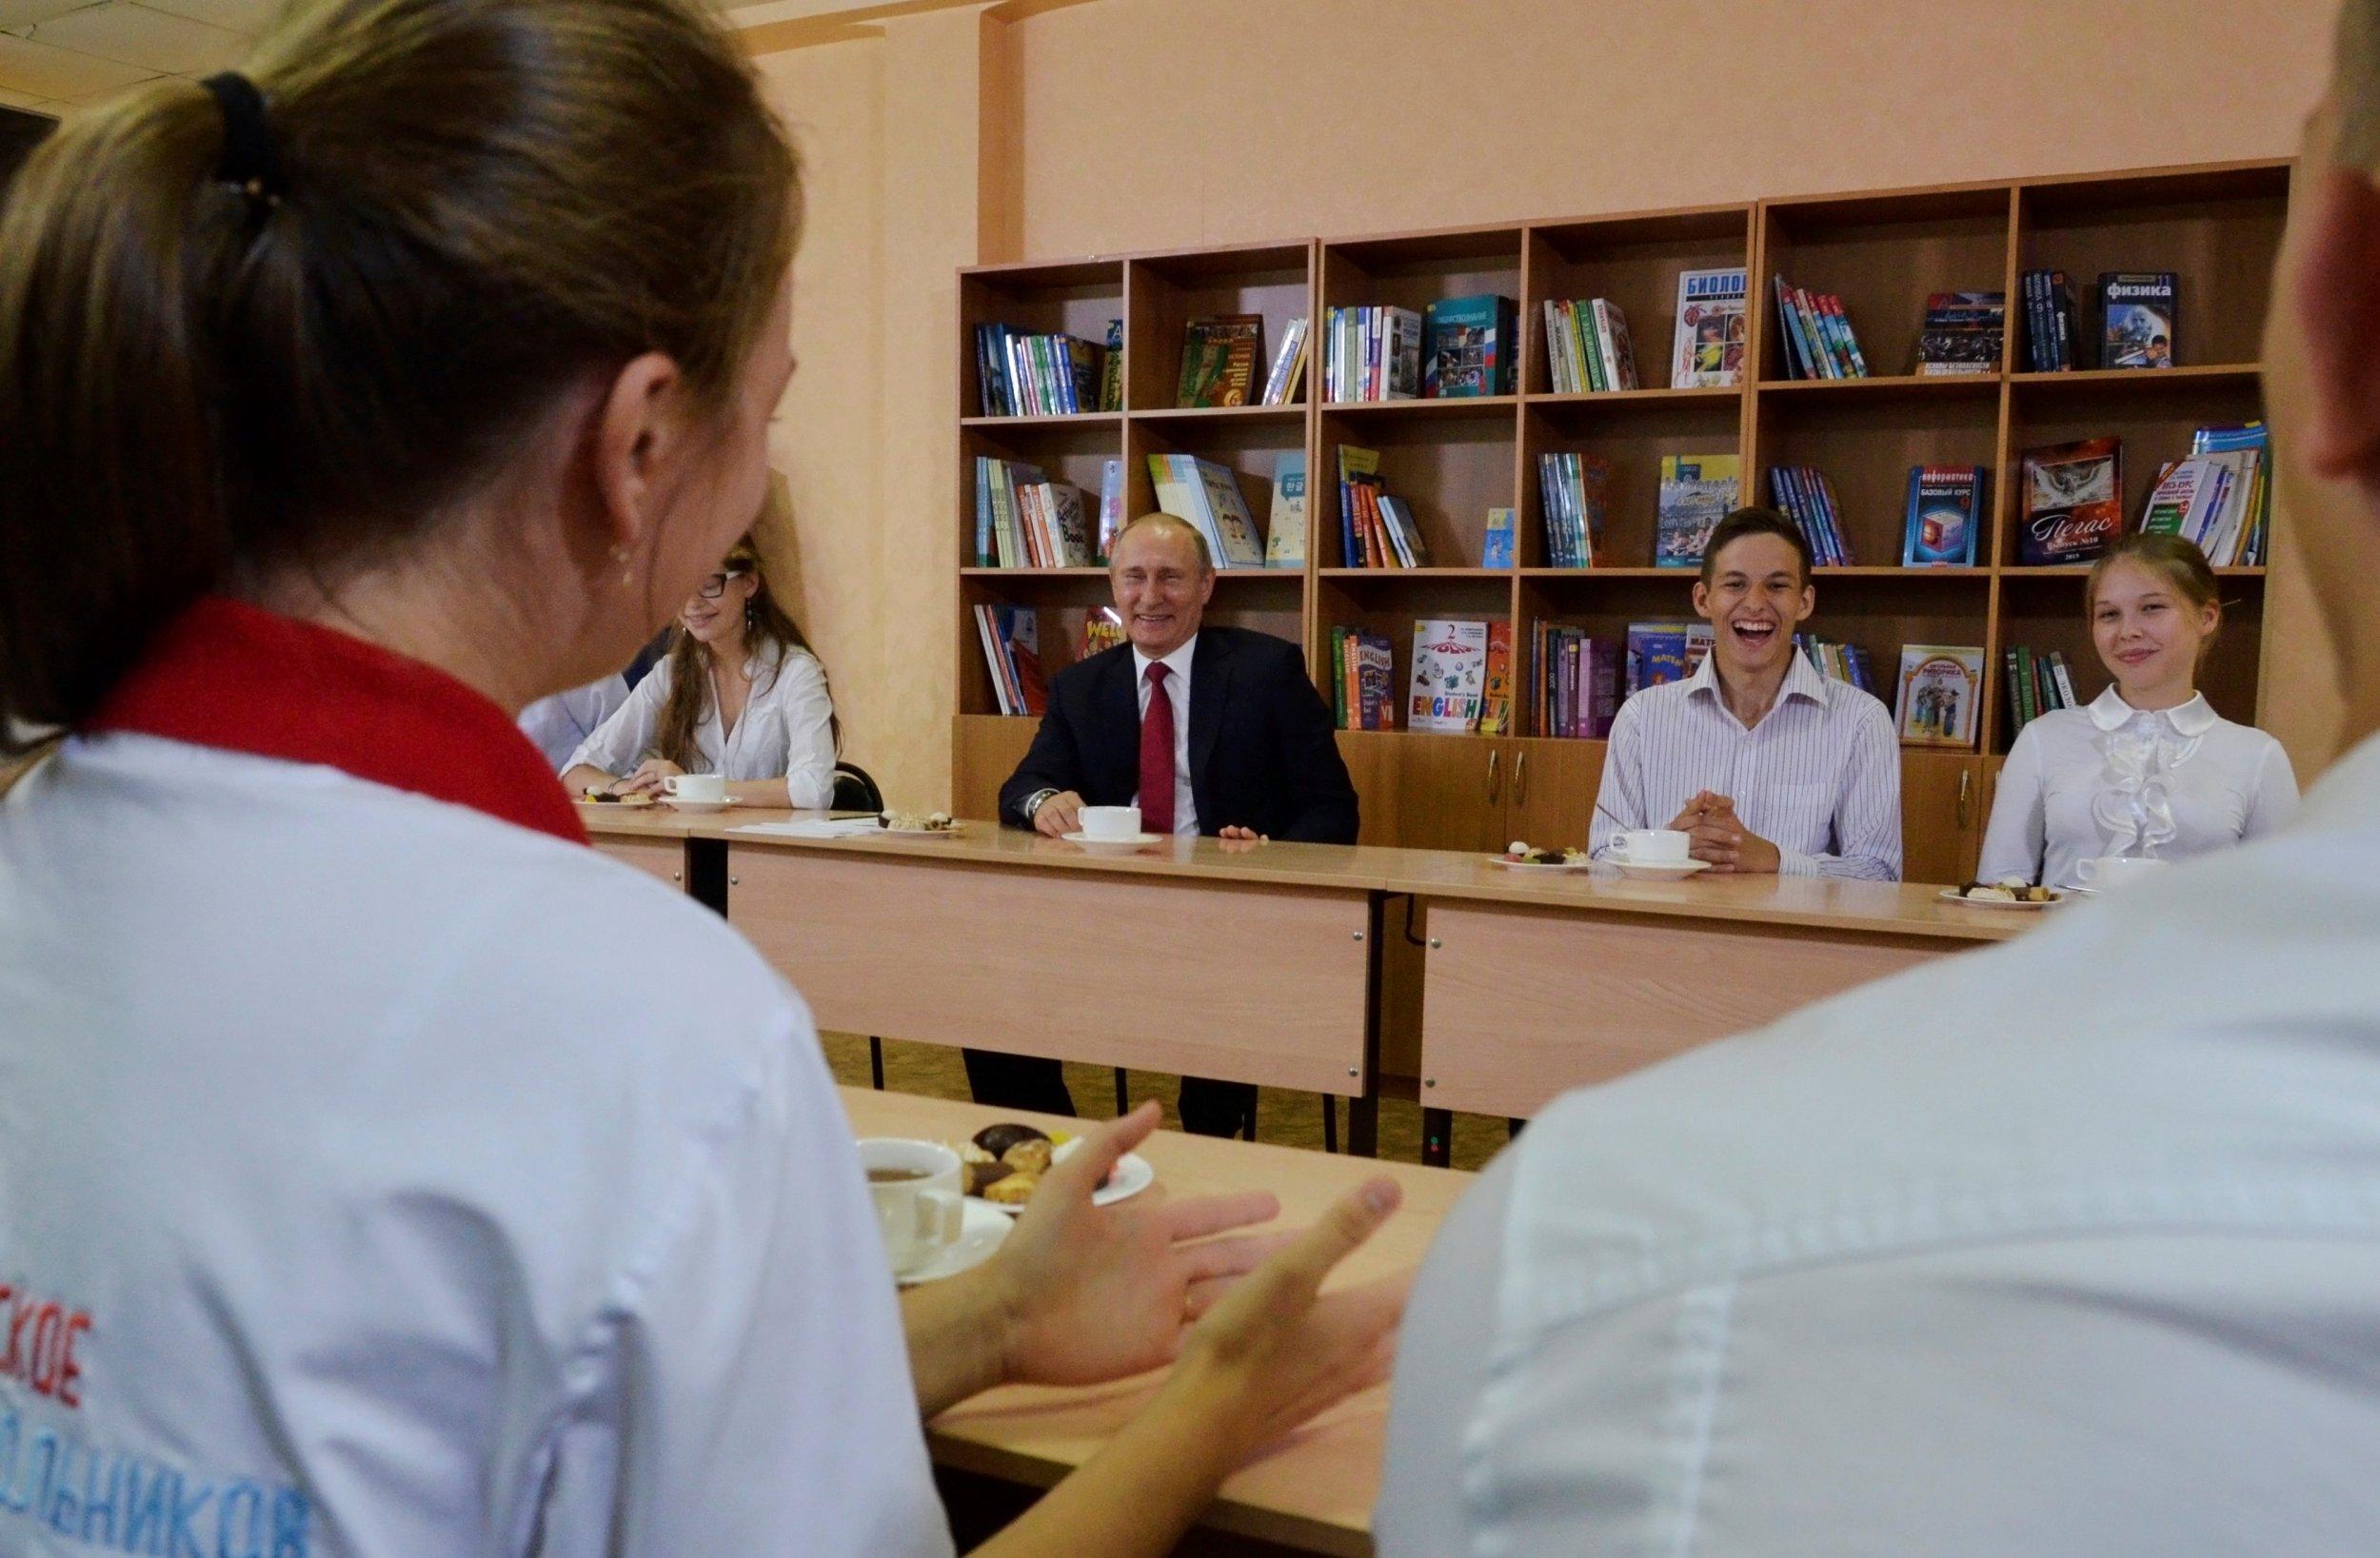 Putin in school